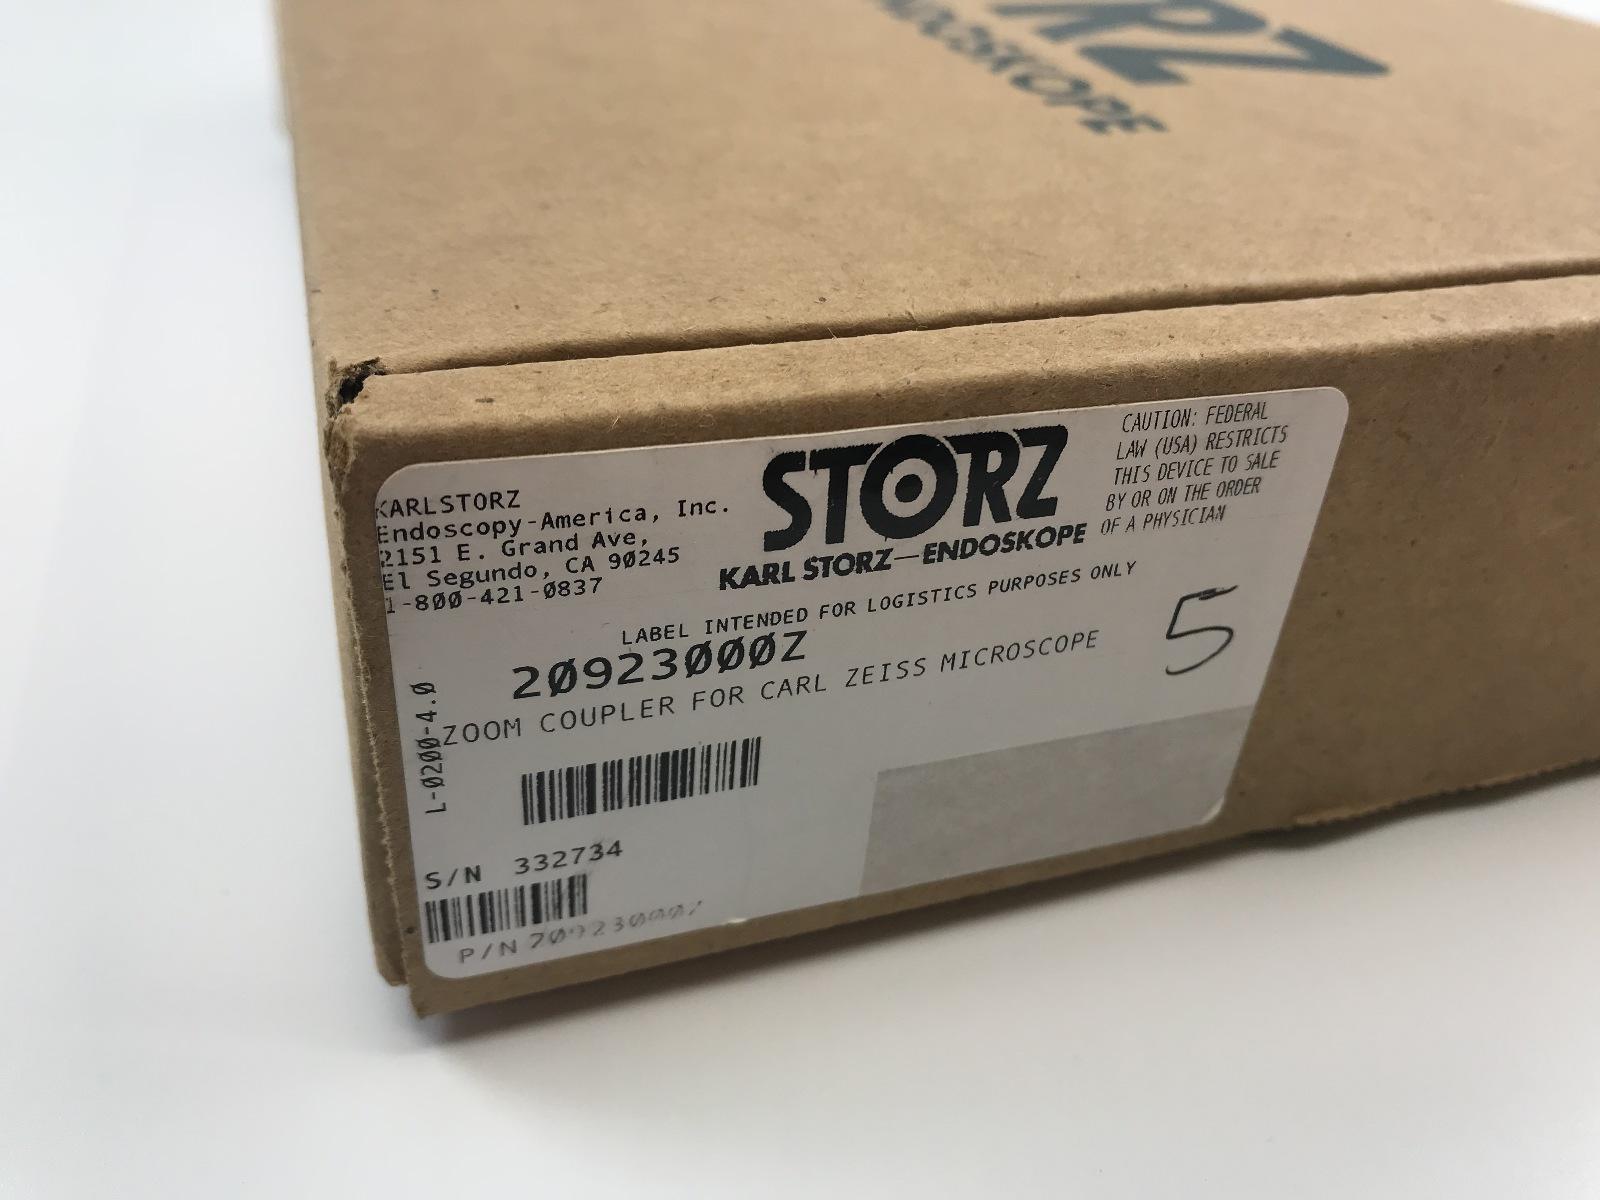 Details about Karl Storz 20923000Z QUINTUS Zoom TV Adaptor, For CARL ZEISS  MEDITEC